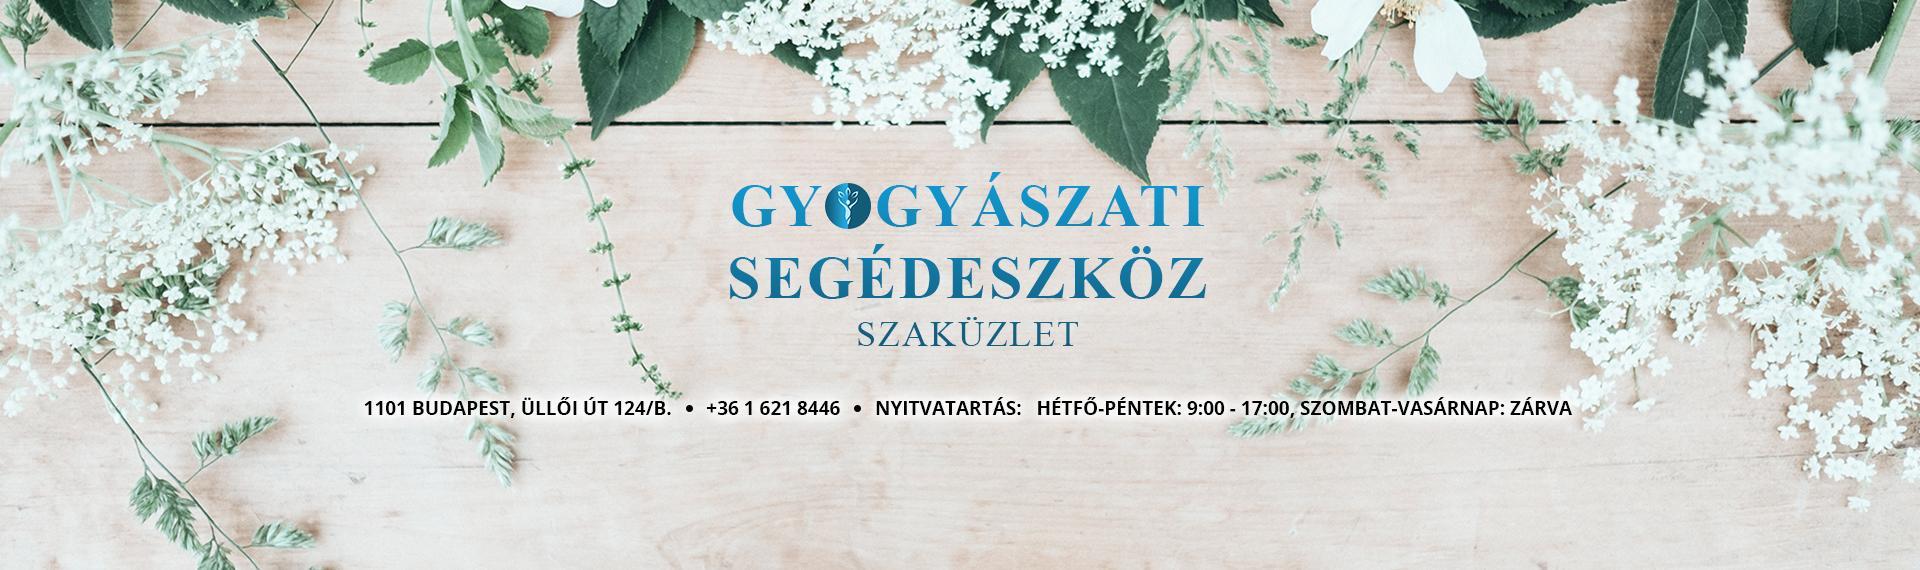 gyogyaszati-header-01-2.jpg